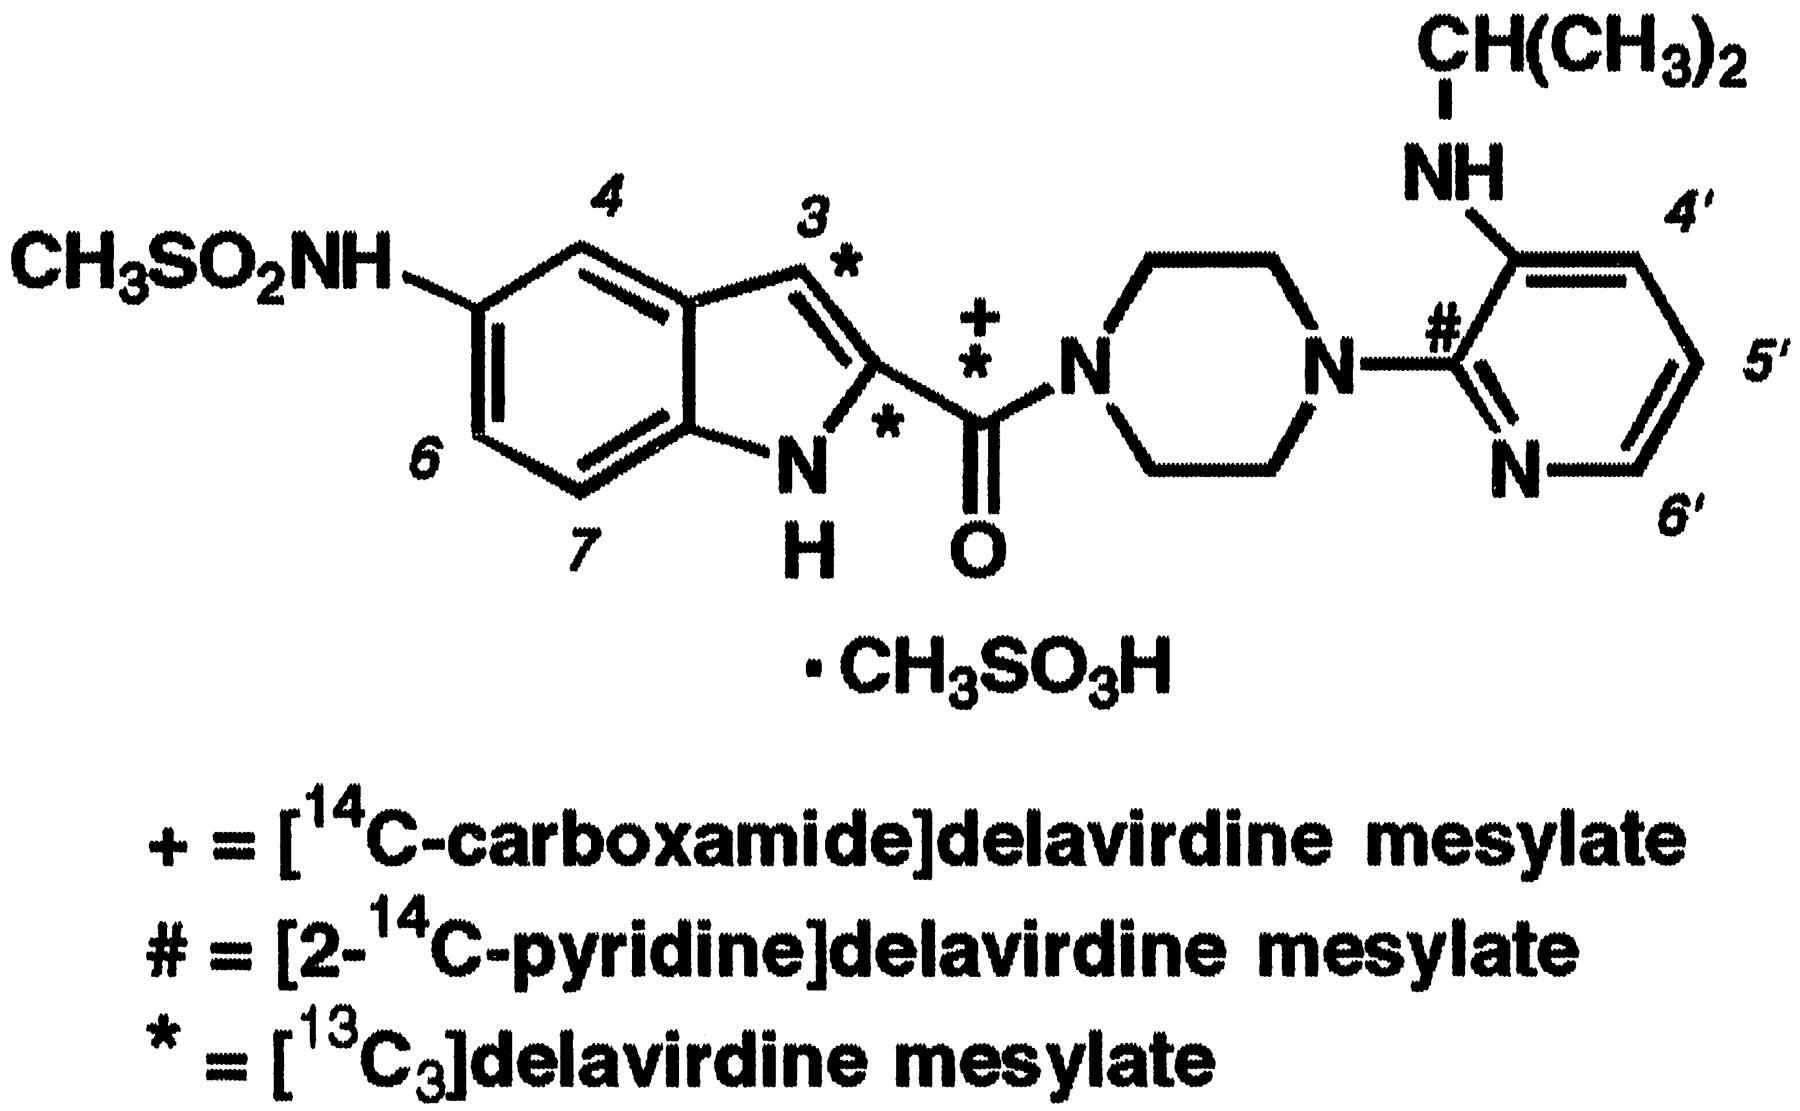 Metabolism of the HIV-1 Reverse Transcriptase Inhibitor